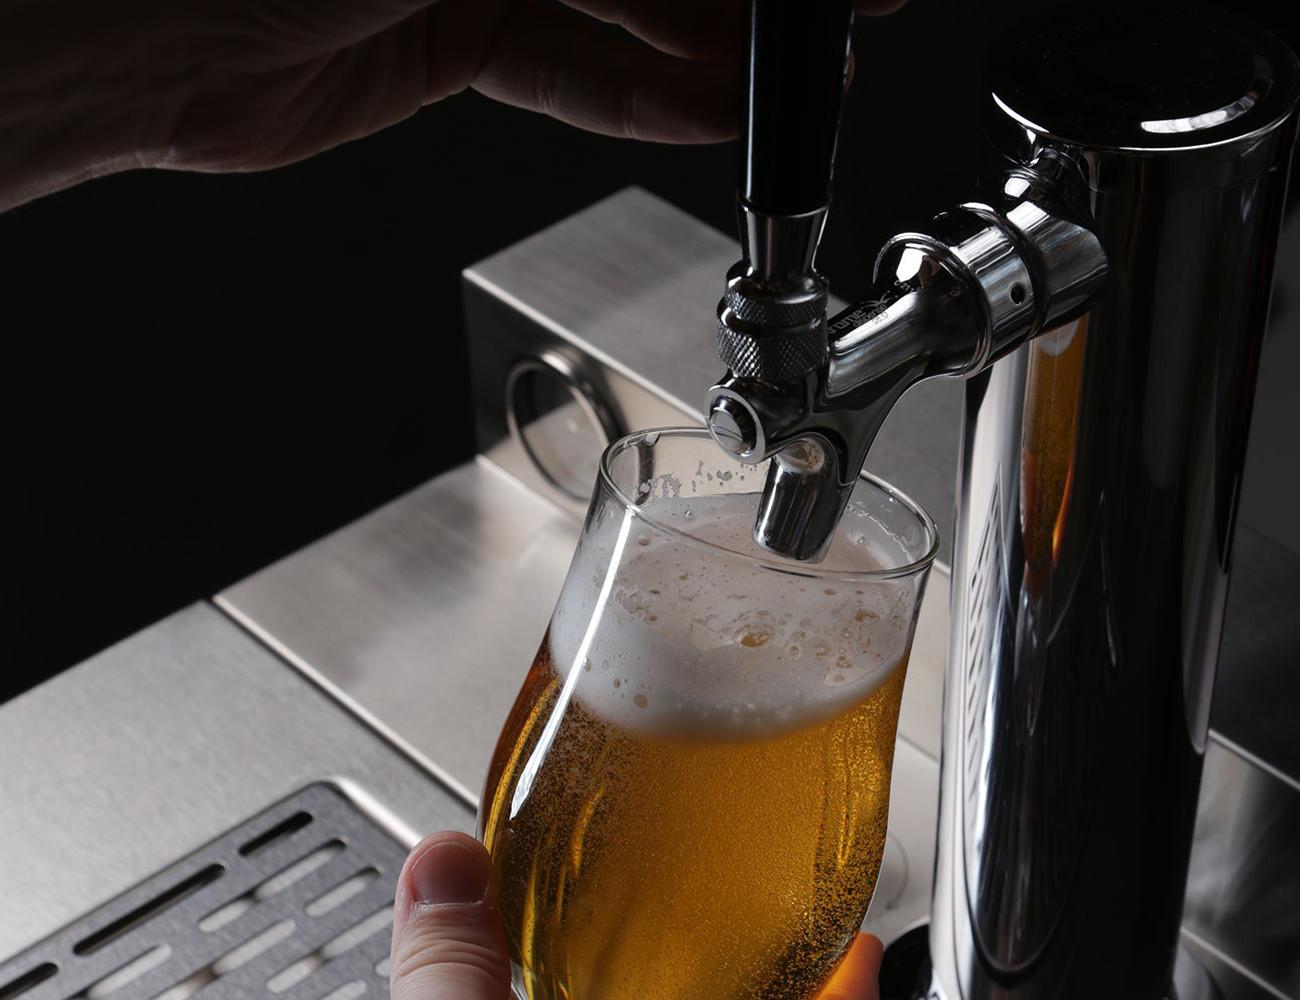 Vessi Fermentor – Home Beer Brewing System